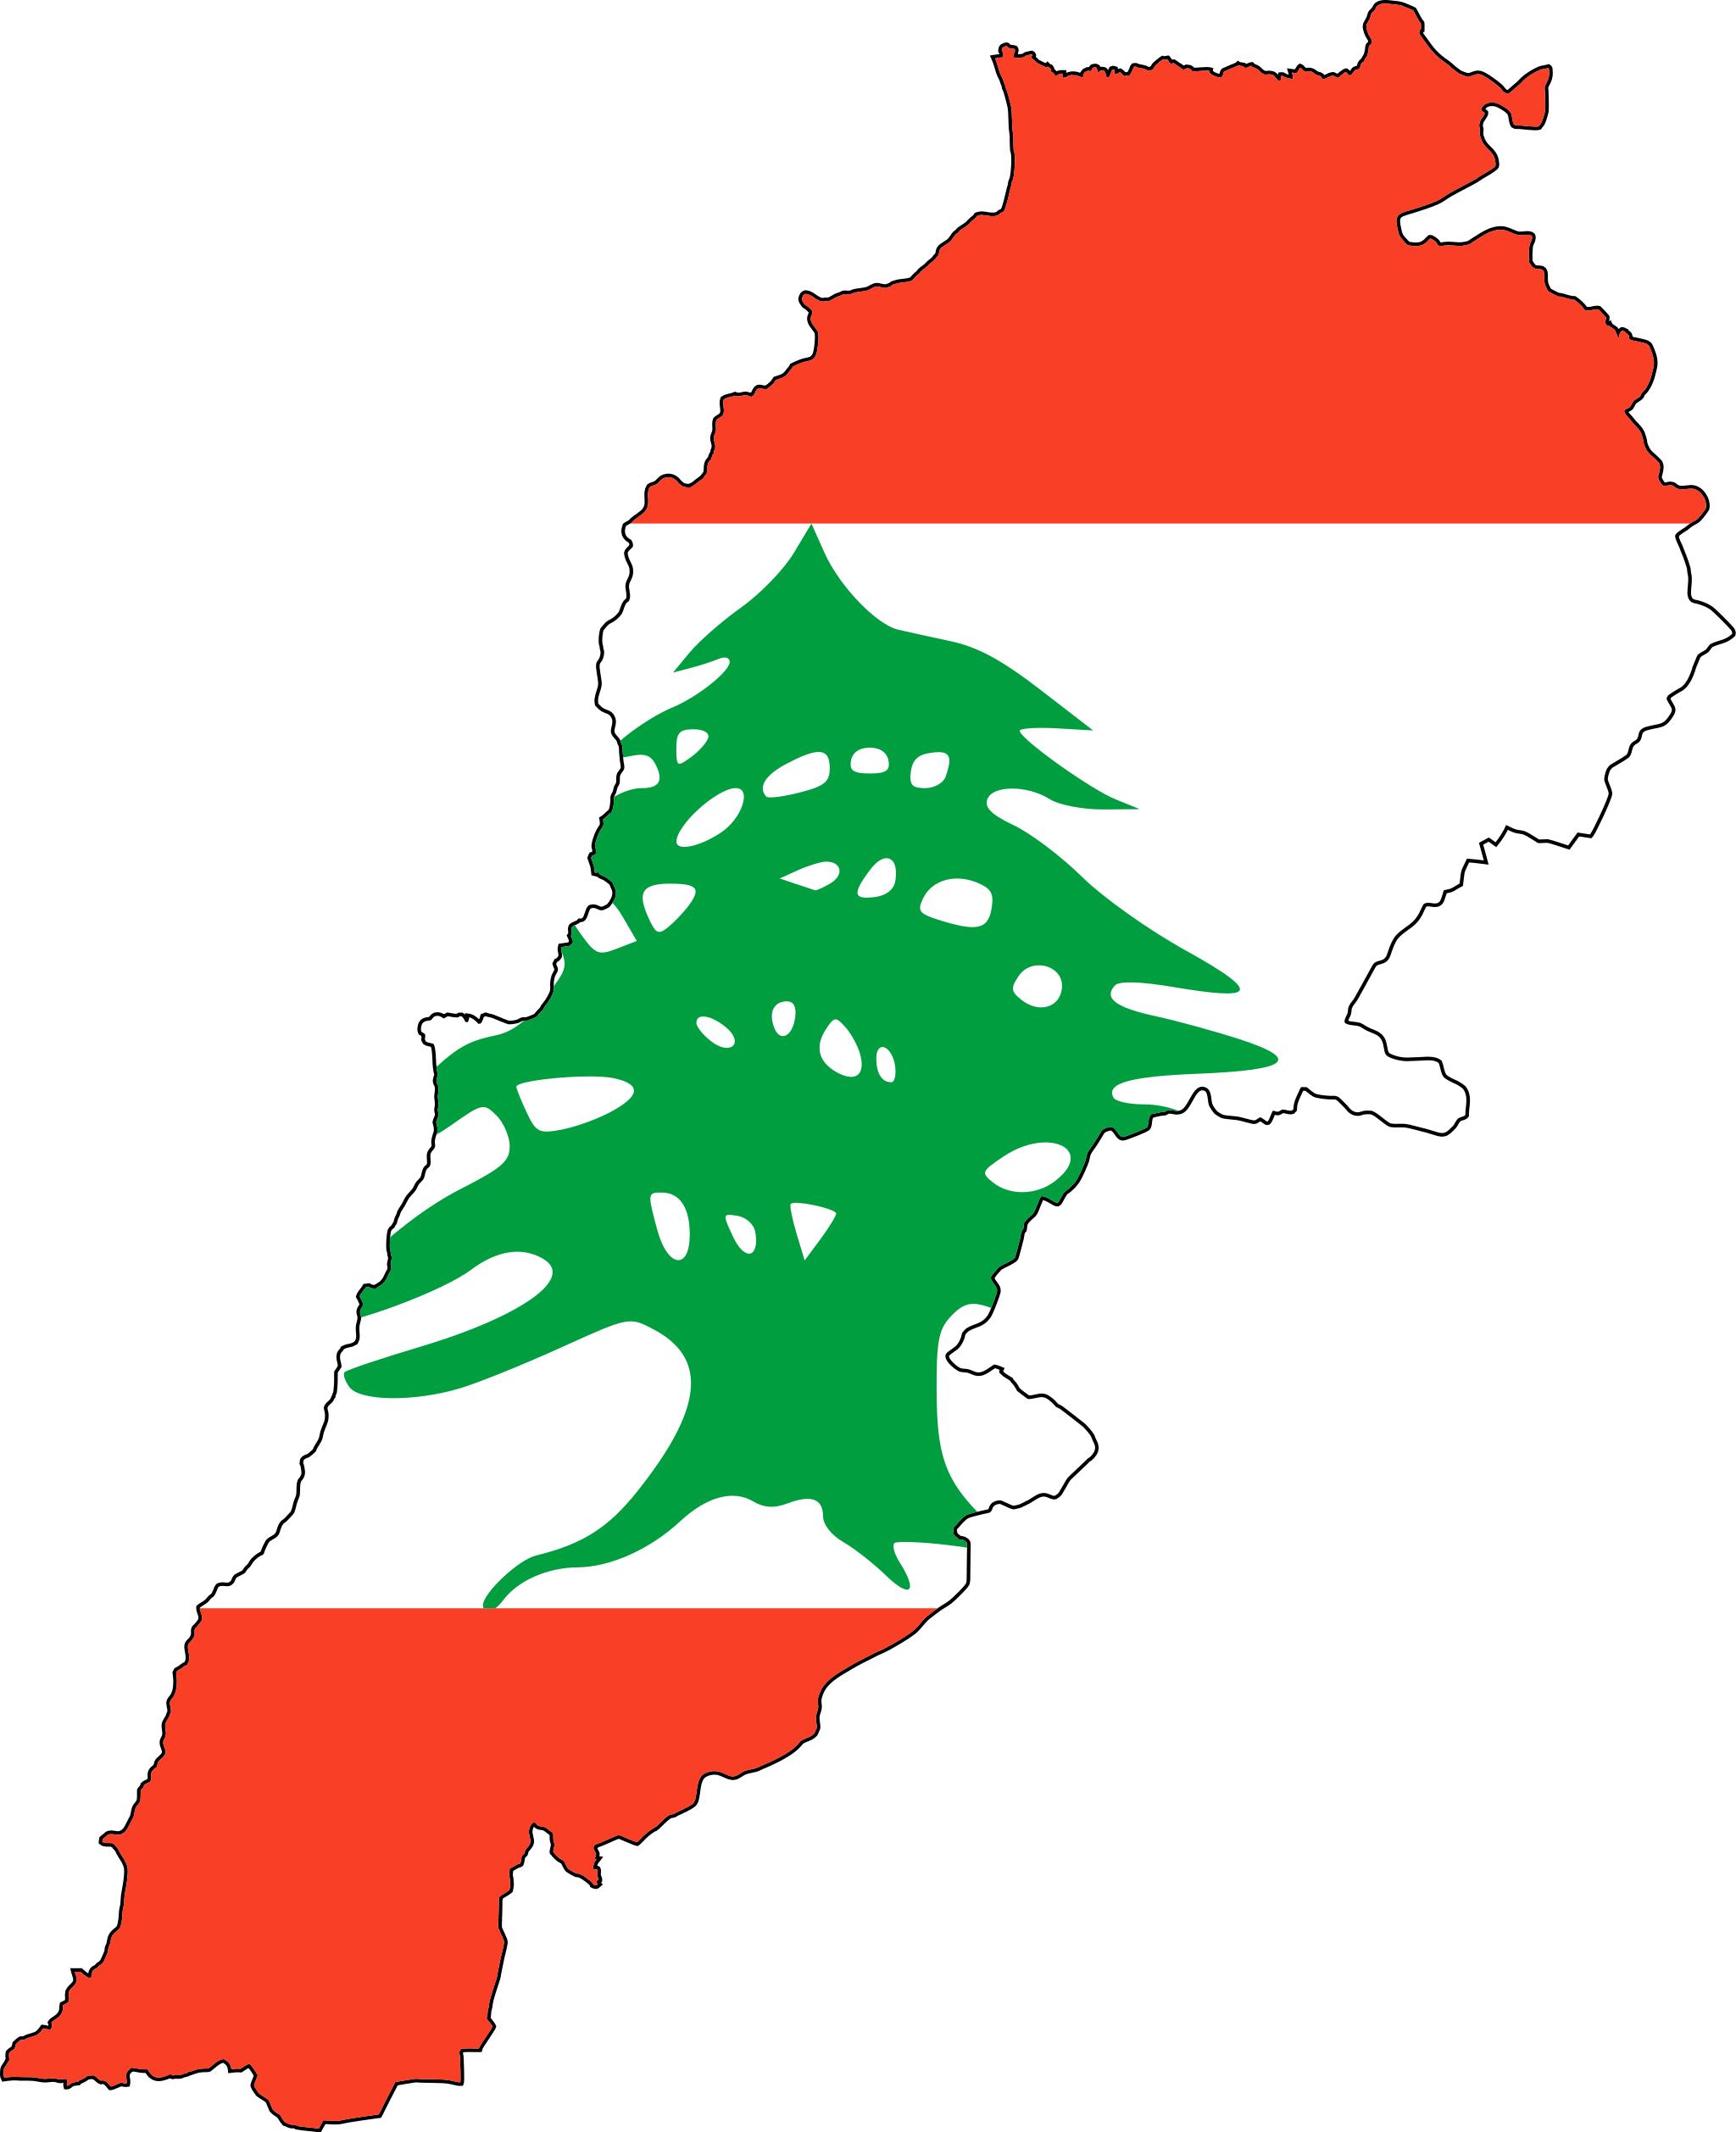 Lebanon flag map mapsof. Taste clipart spicy